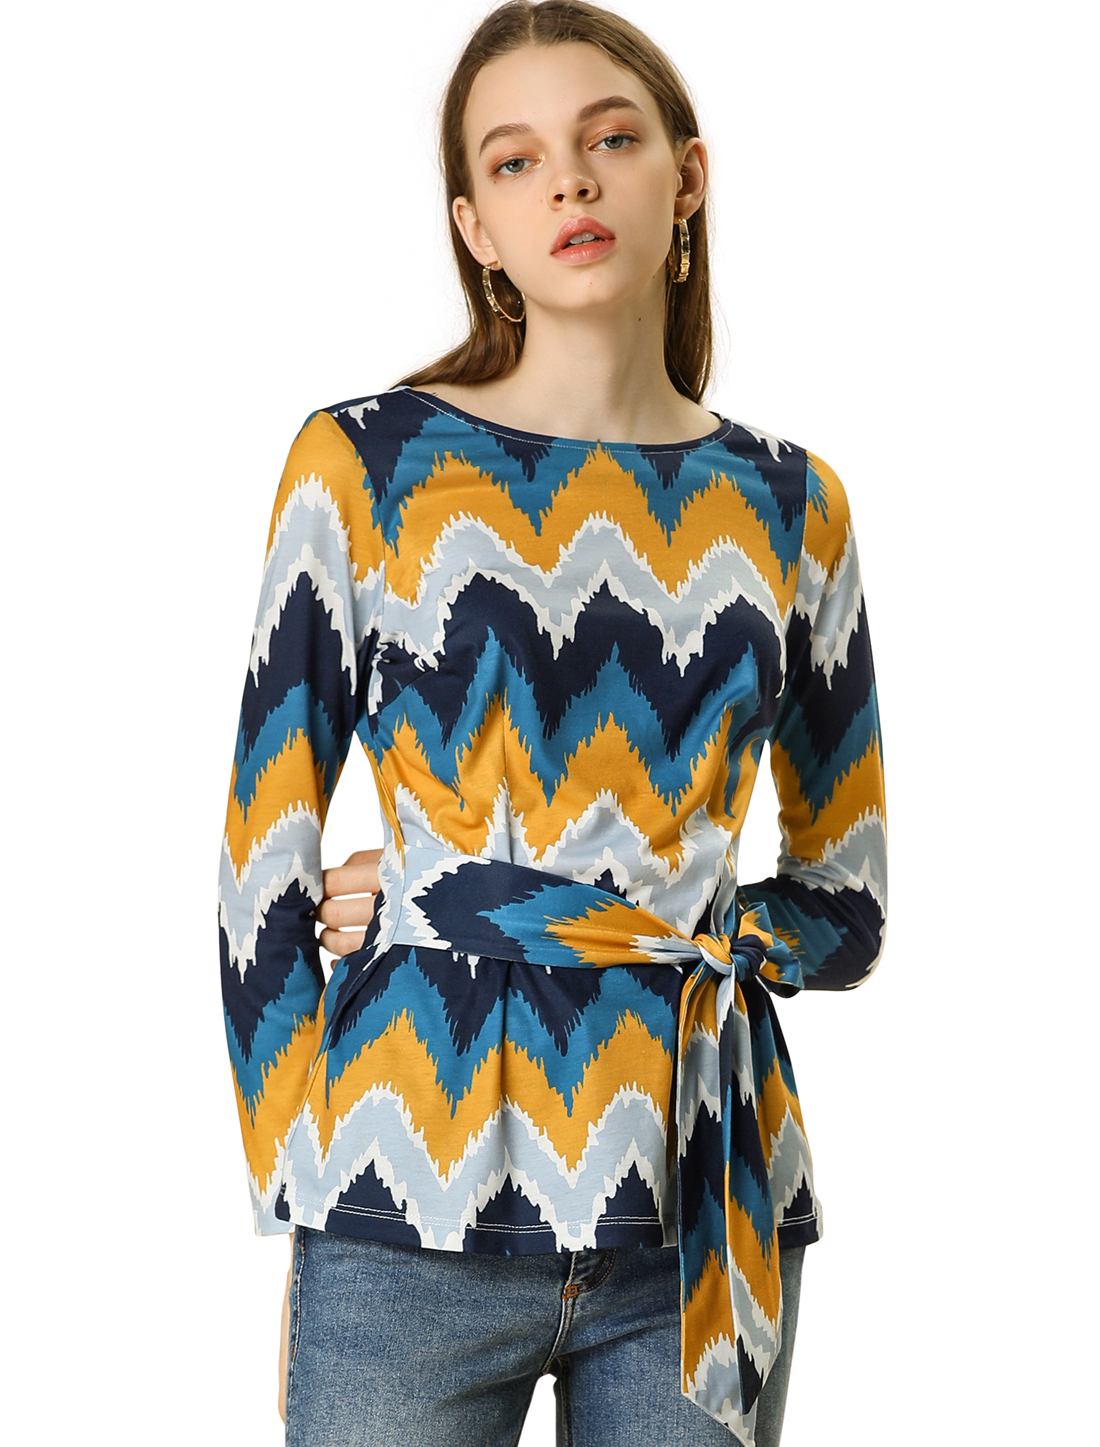 Allegra K Women's Zig-zag Pattern Round Neck Long Sleeve Belted Knit Top Blue L